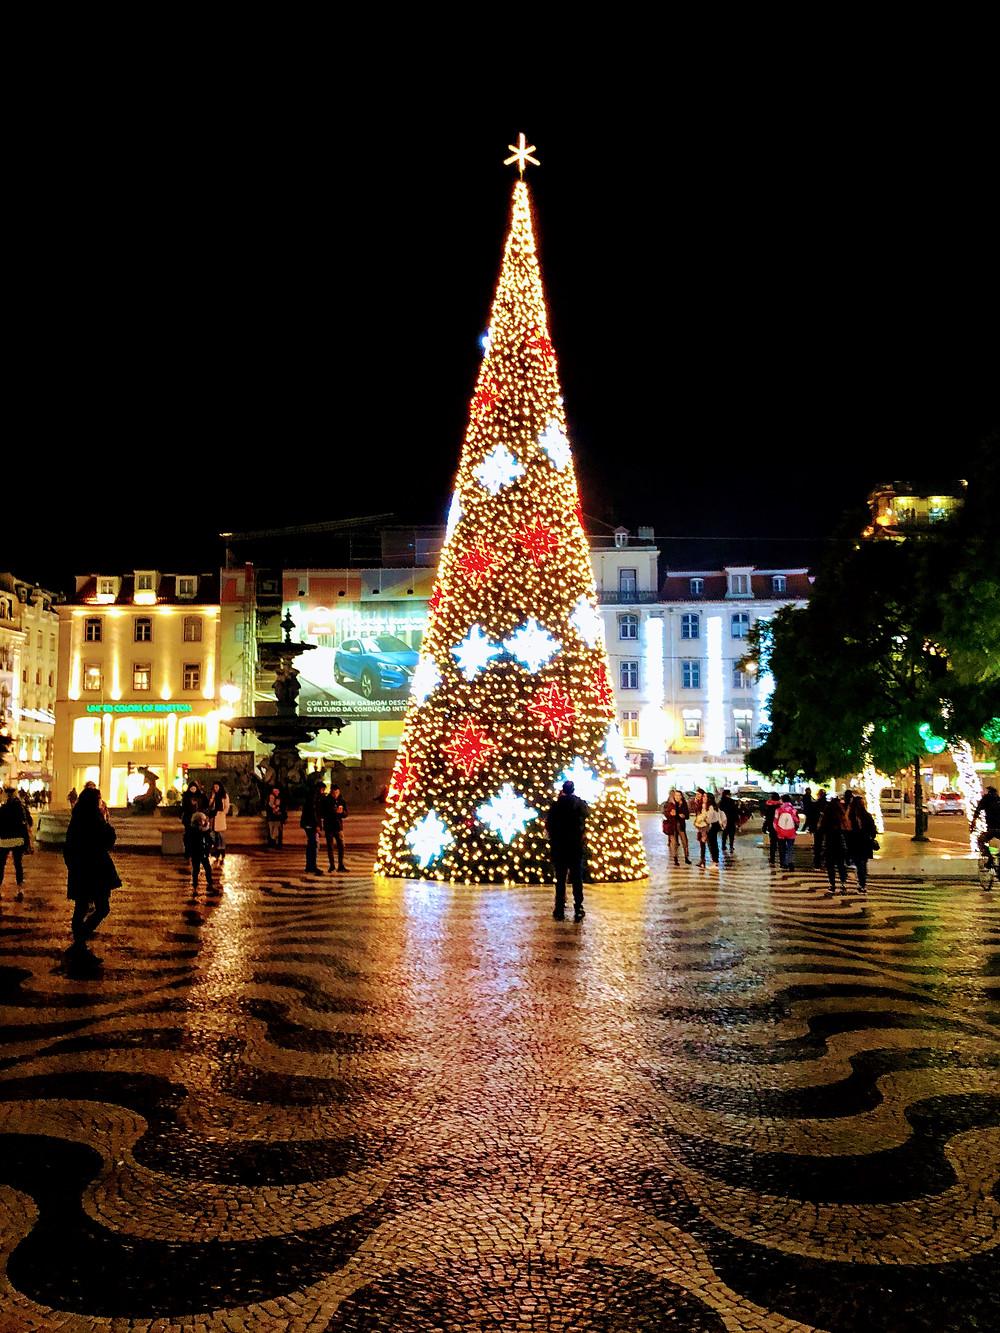 Iluminação natalina